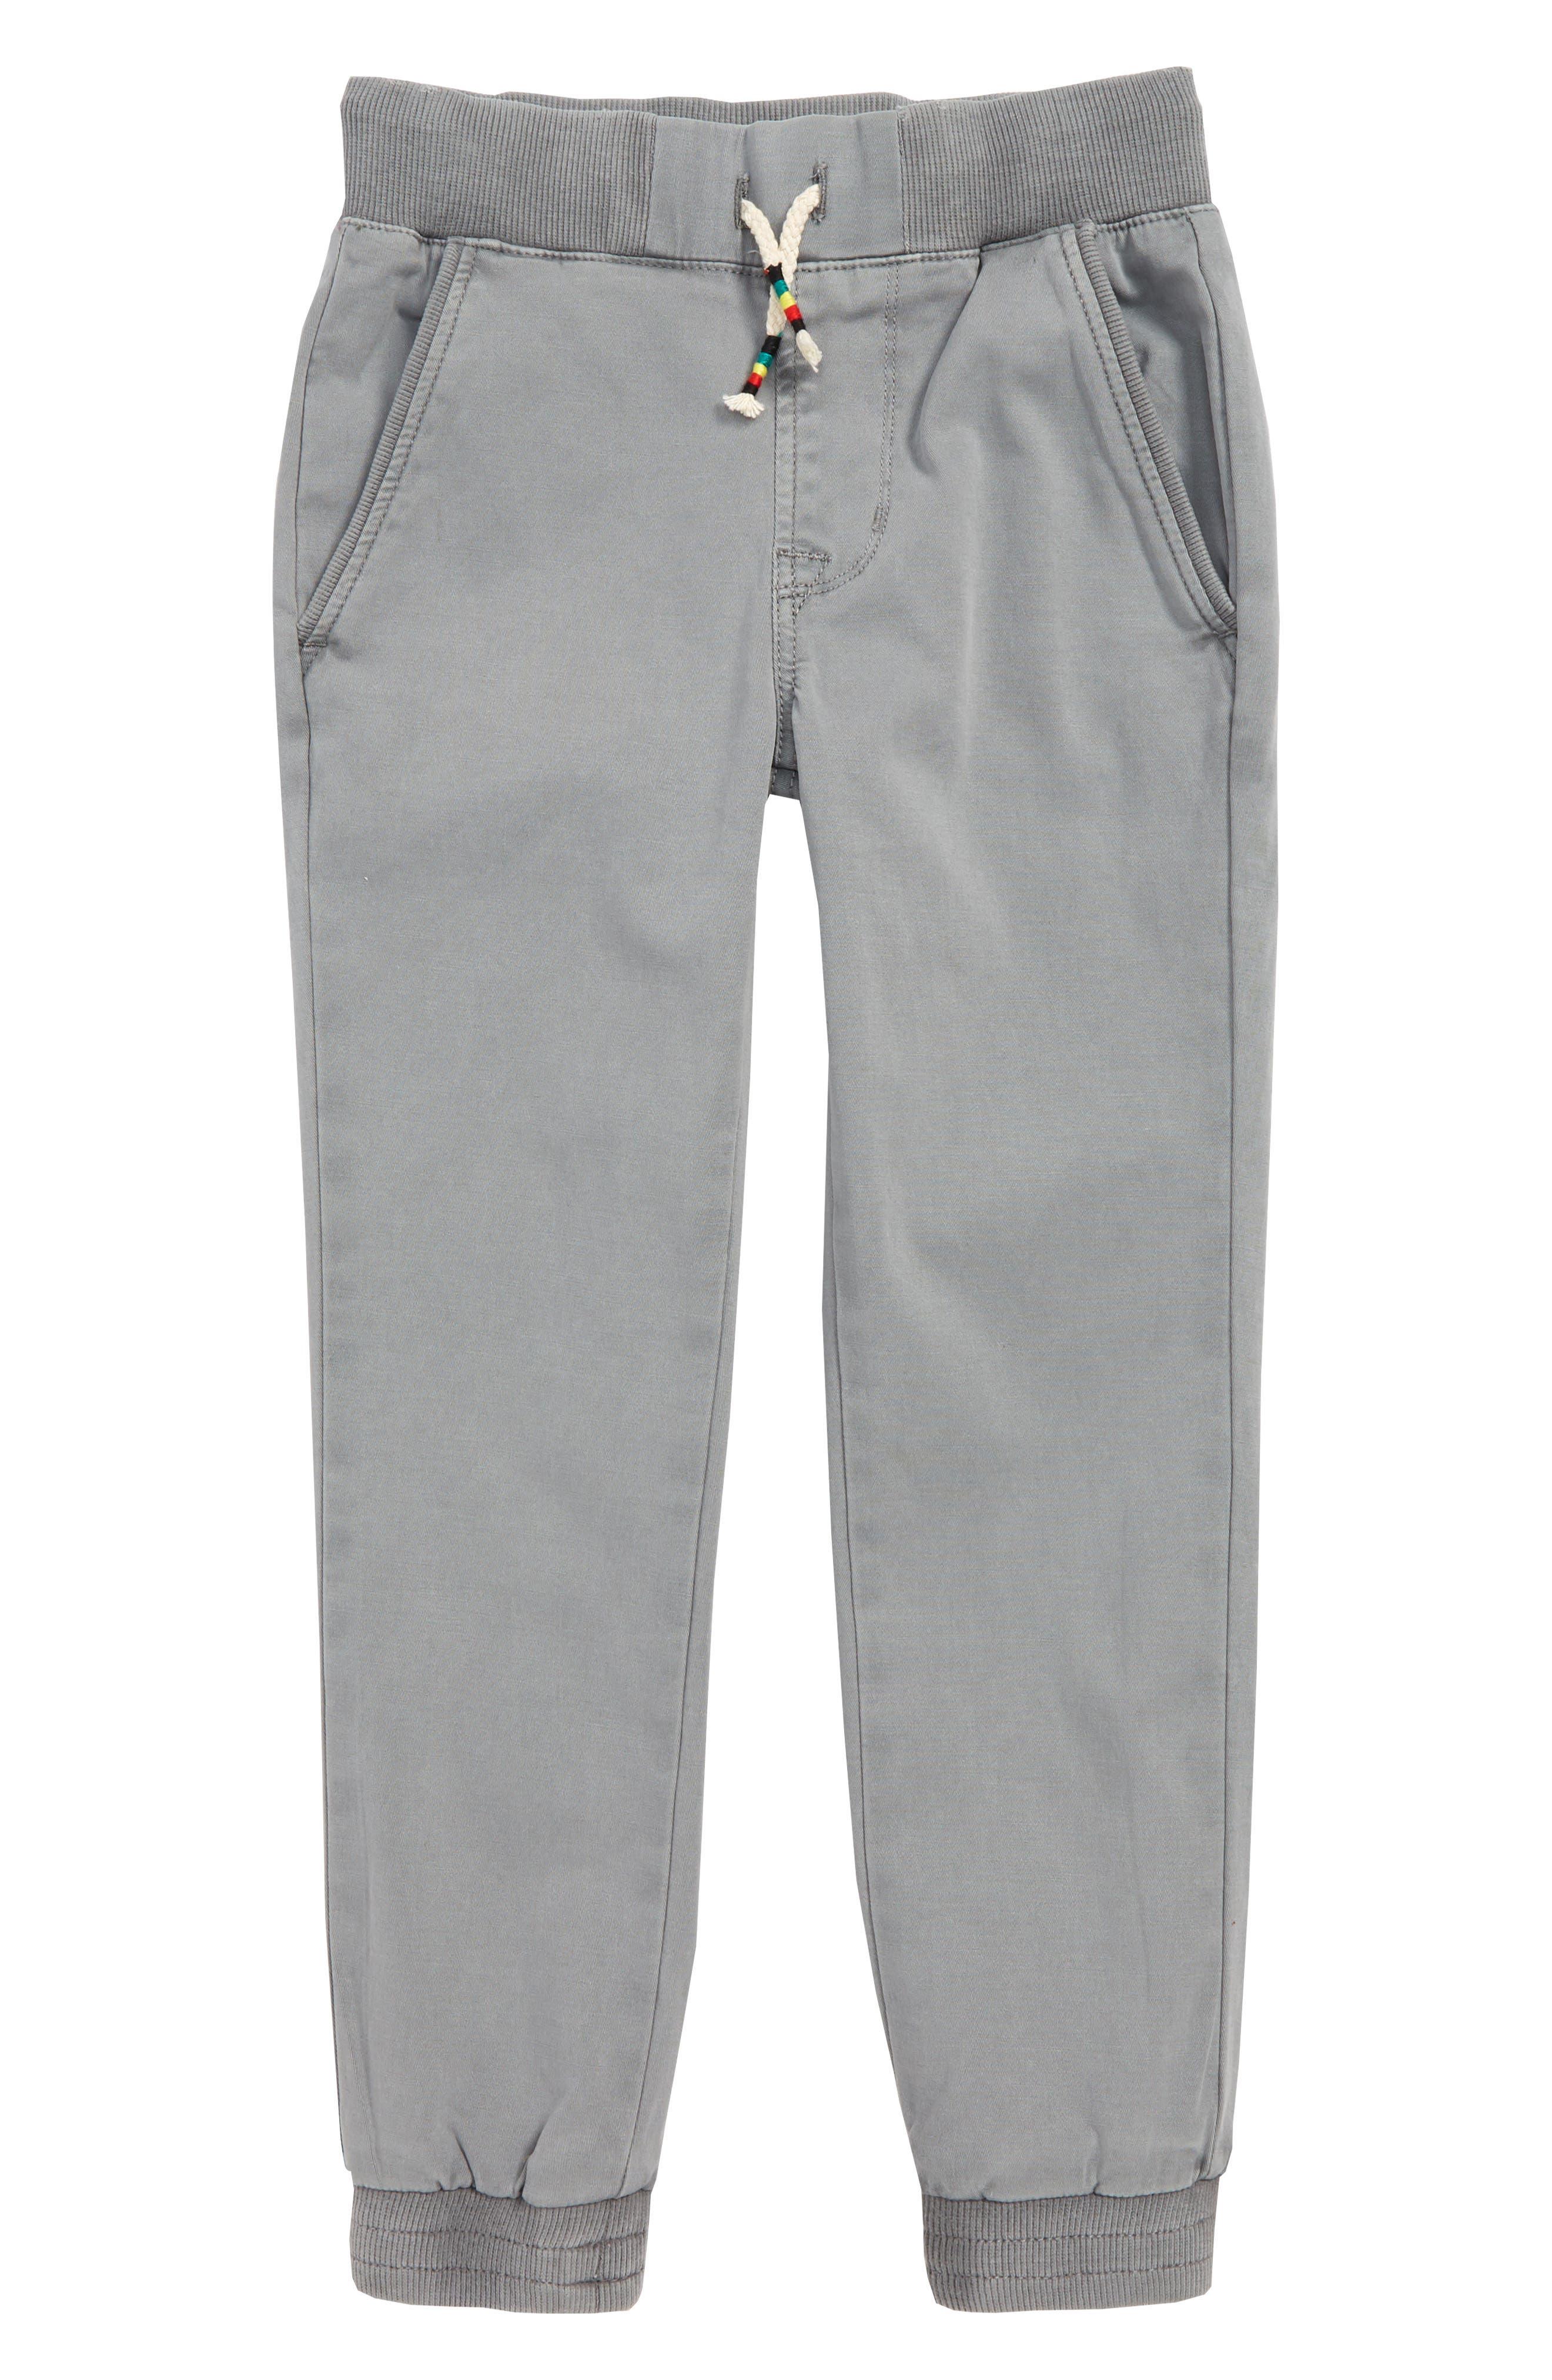 Toddler Boys Hudson Jeans Rylan Jogger Sweatpants Size 3T  Grey